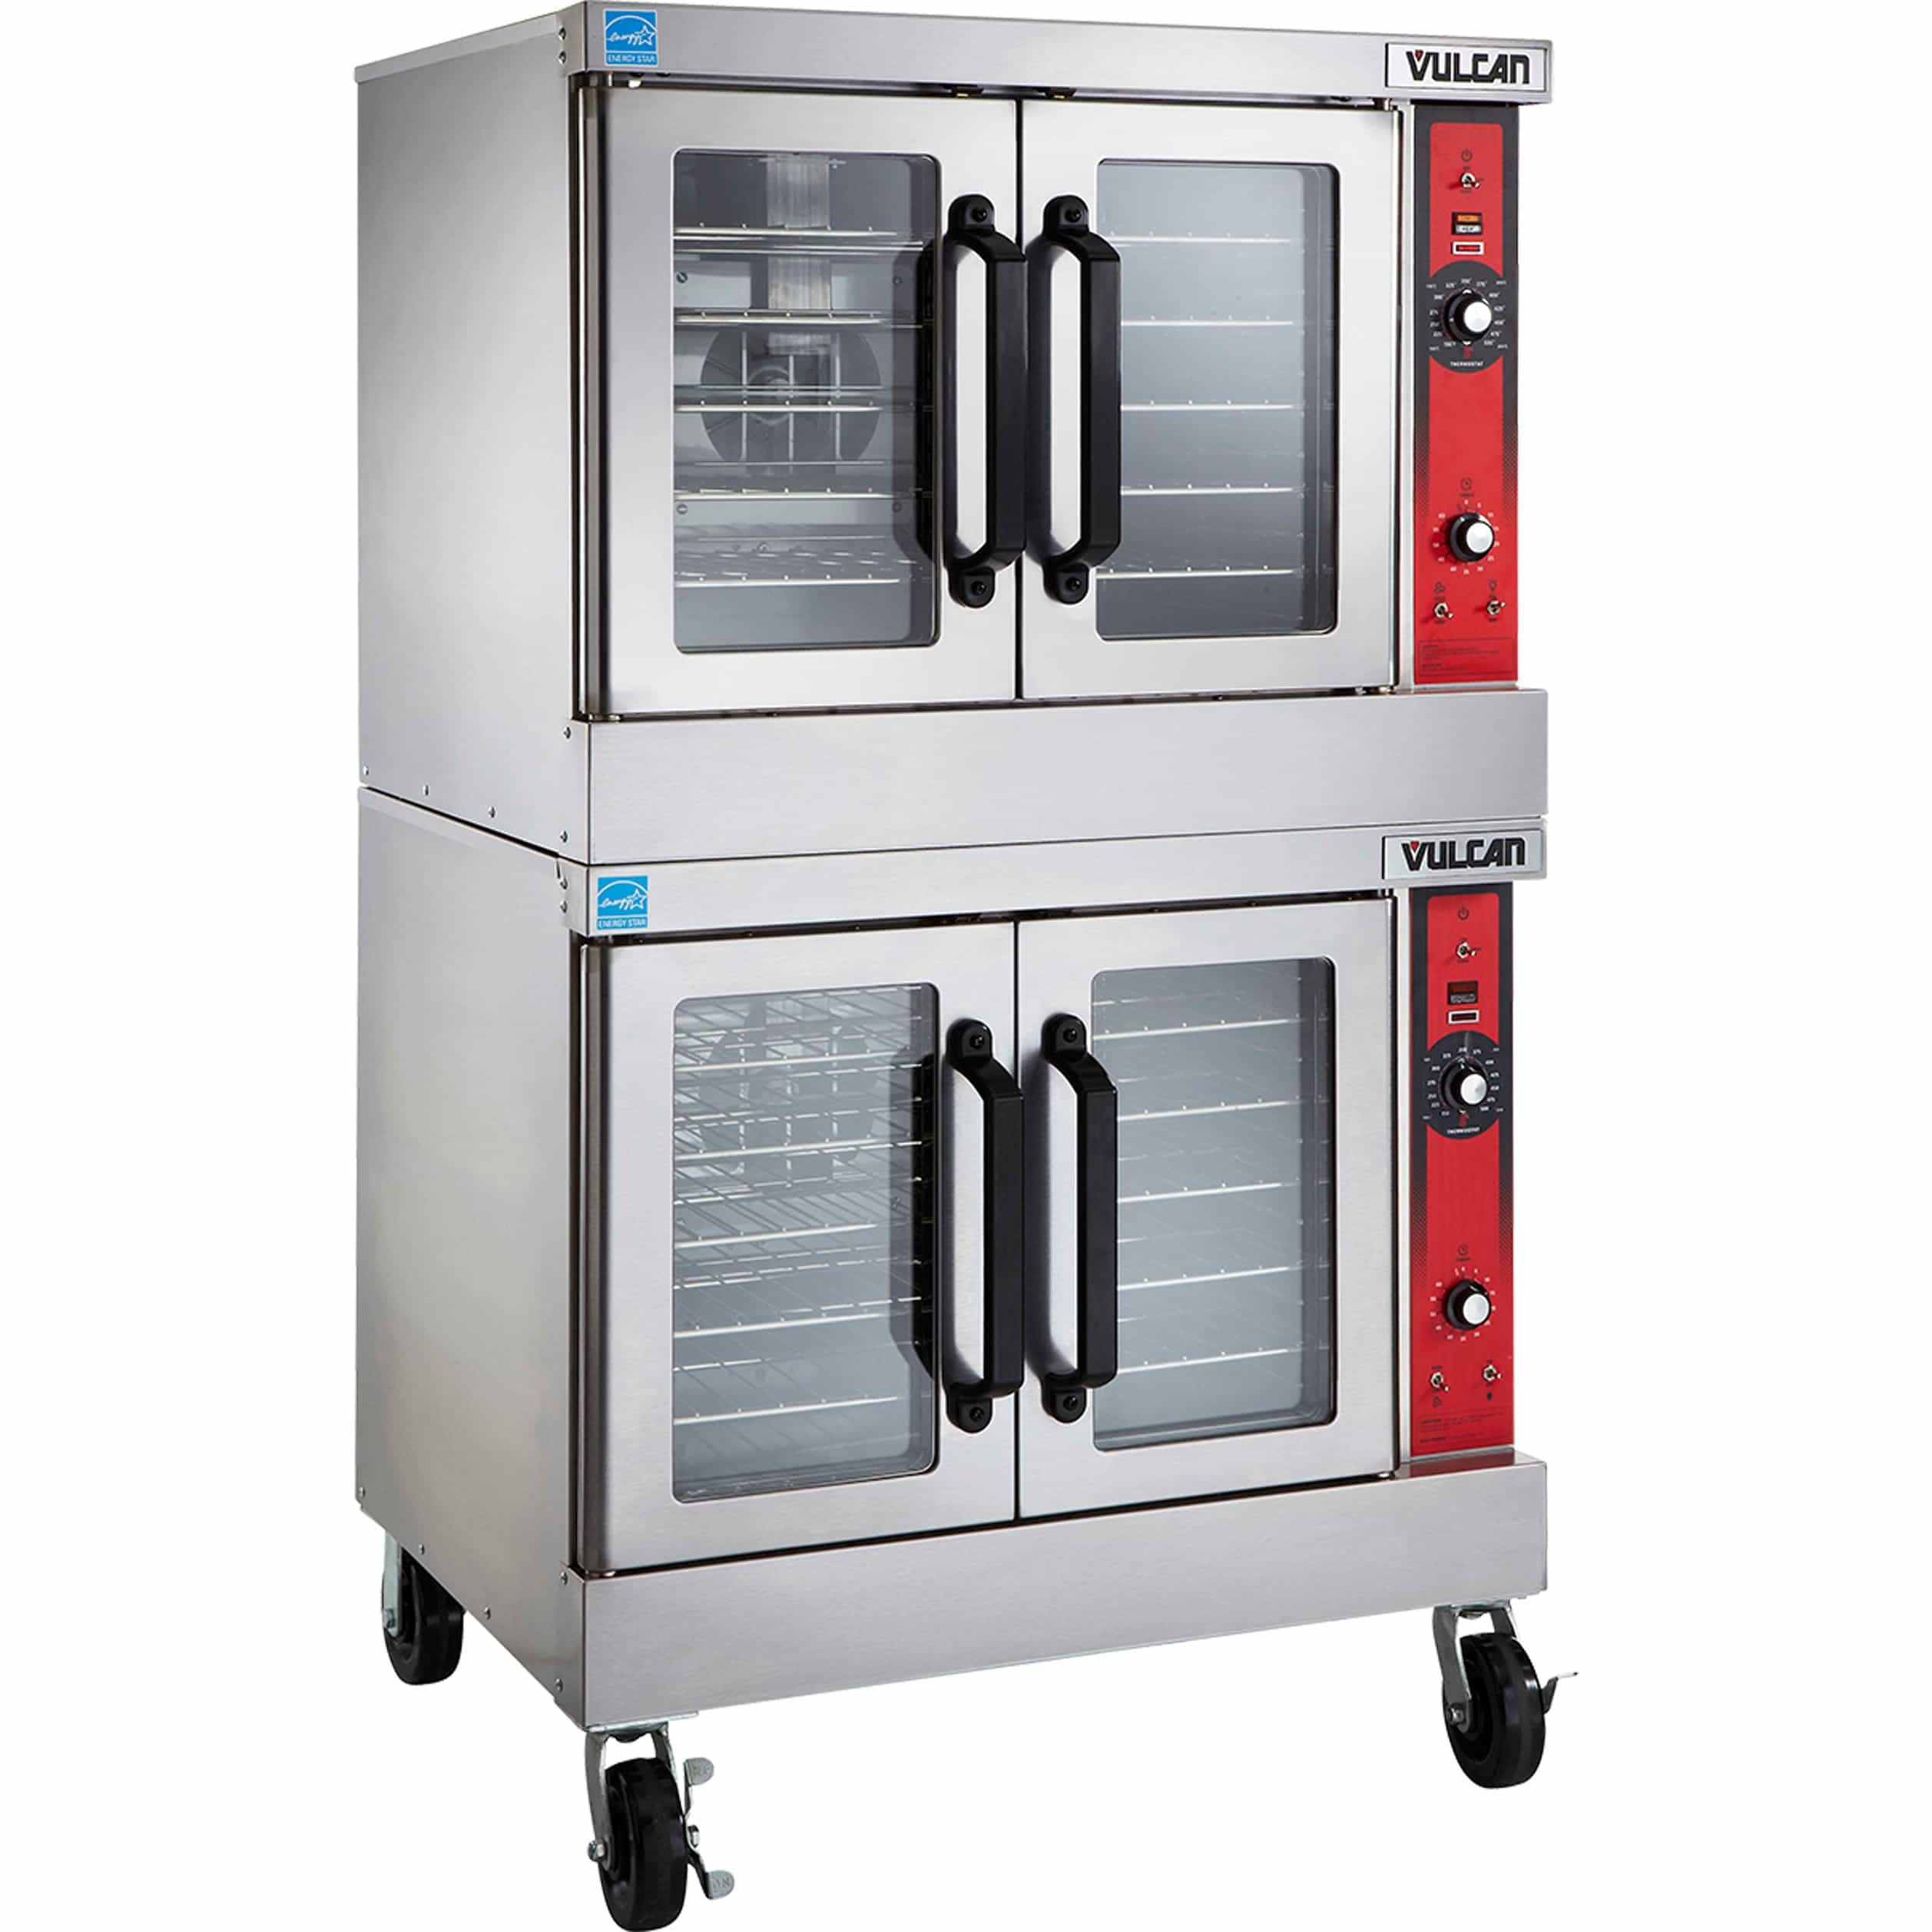 vulcan vc44ed convection oven kitchen equipment. Black Bedroom Furniture Sets. Home Design Ideas